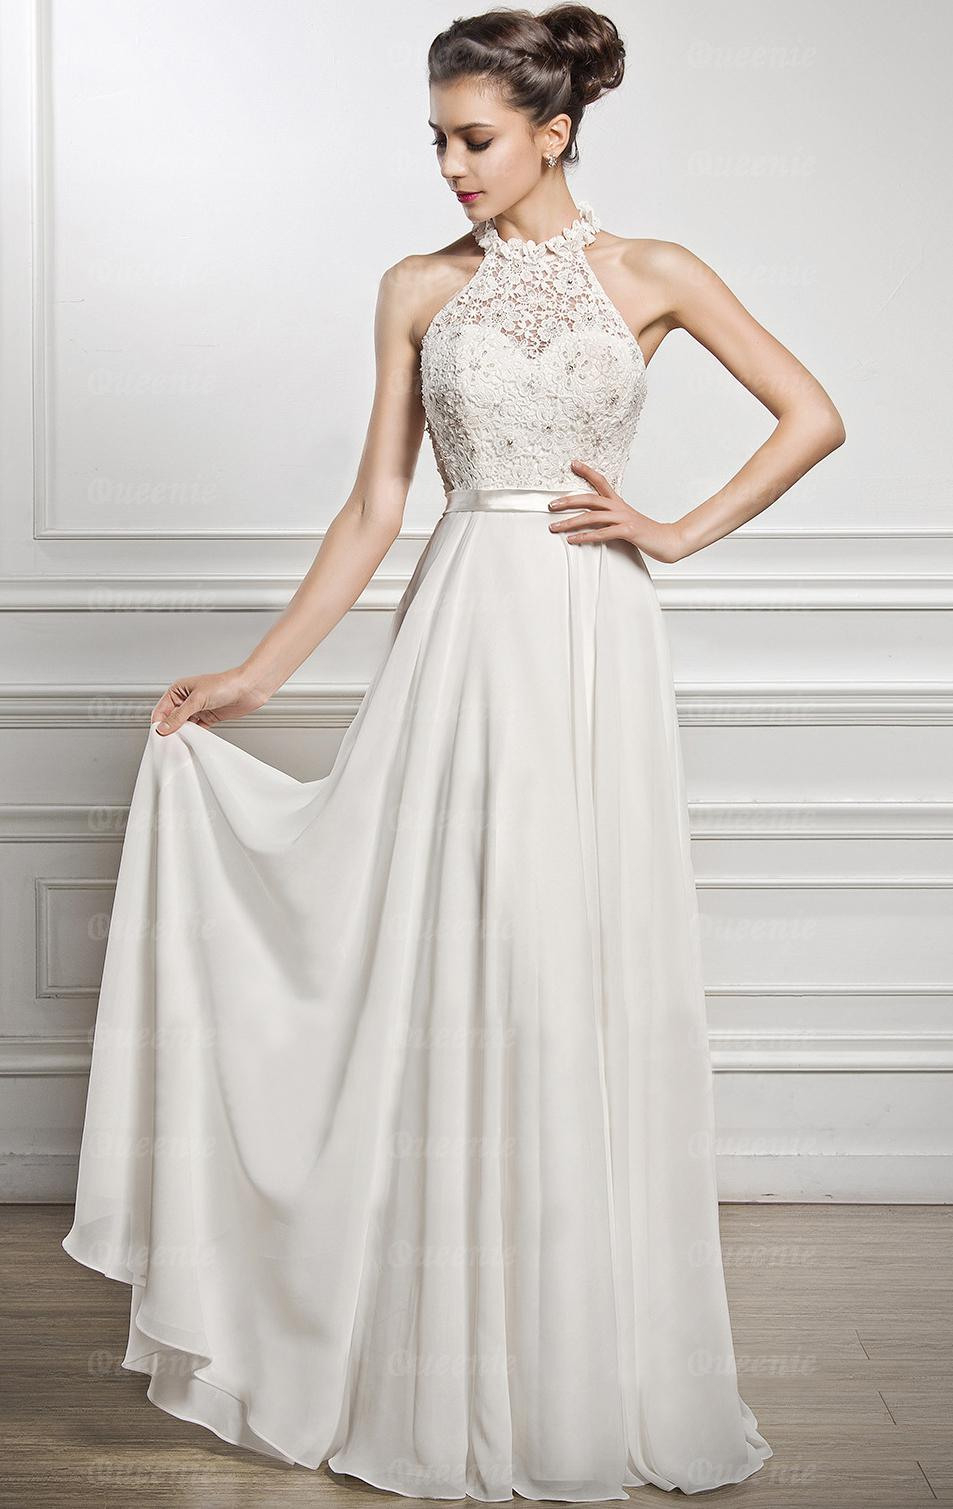 Formal Genial Abend Kleid In Weiss VertriebFormal Fantastisch Abend Kleid In Weiss Bester Preis